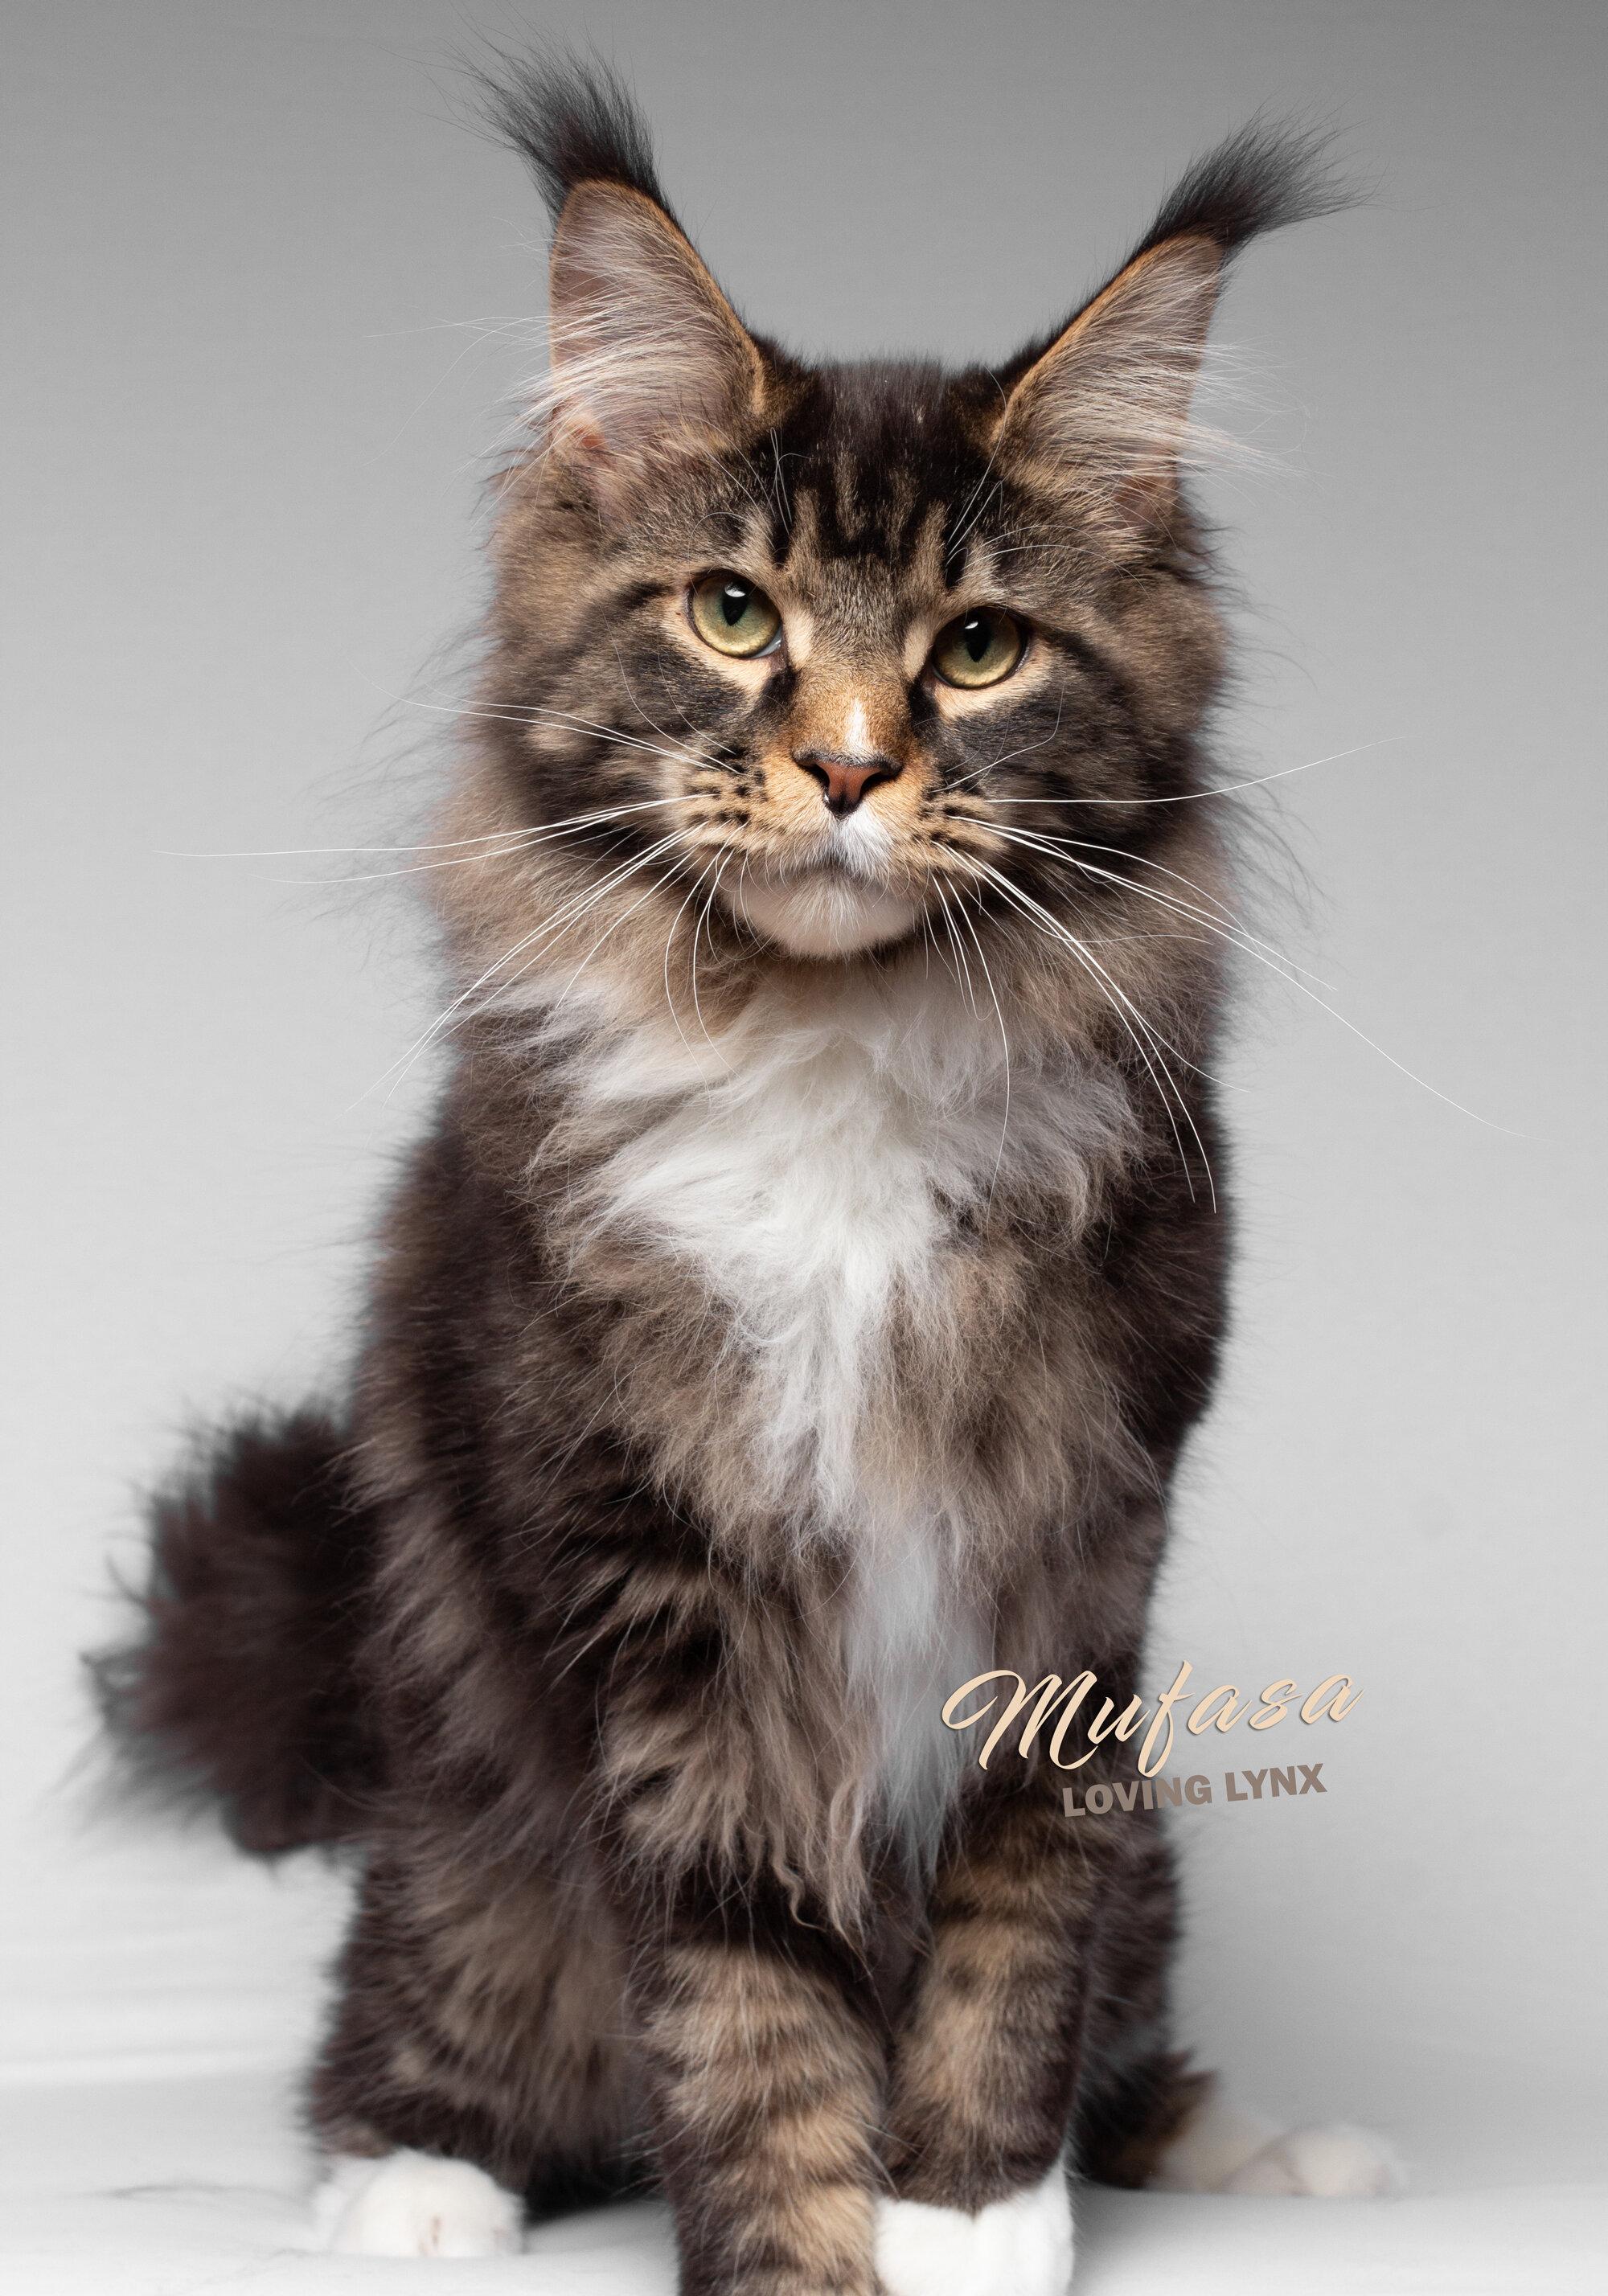 Maine Coon Kittens For Sale Tn : maine, kittens, Maine, Breeders, LOVING